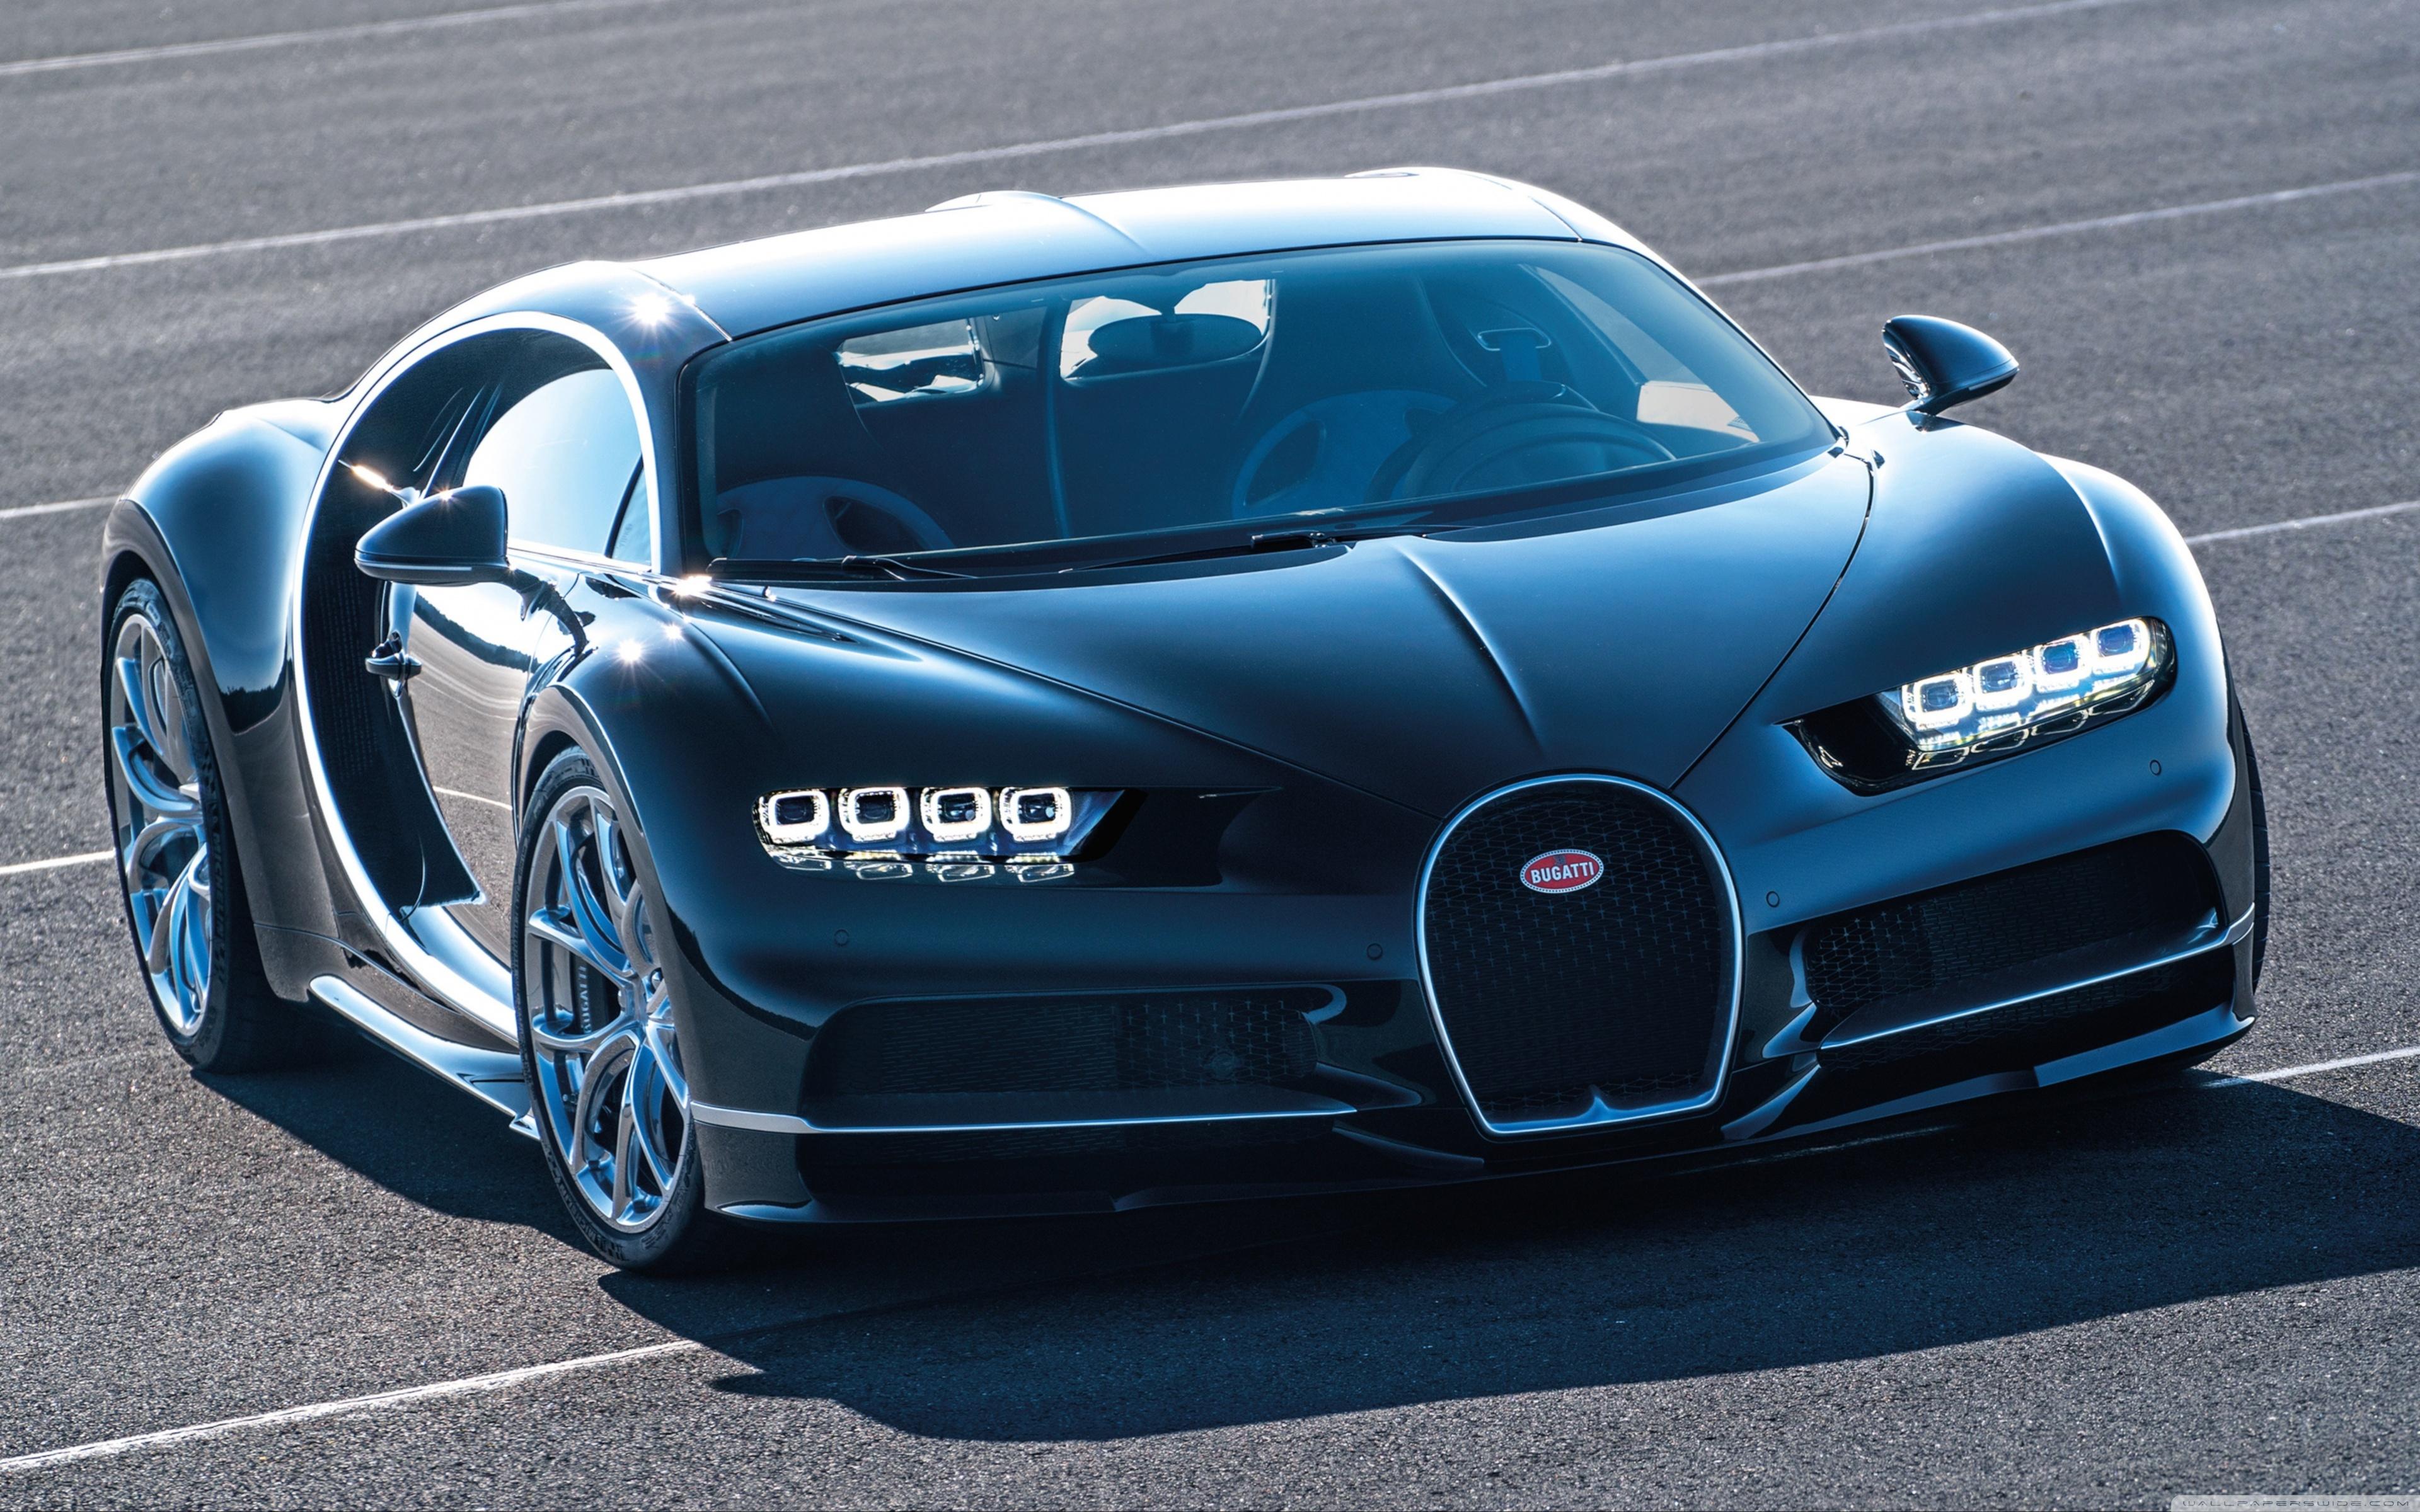 Bugatti Chiron 3840x2400 Wallpaper Teahub Io